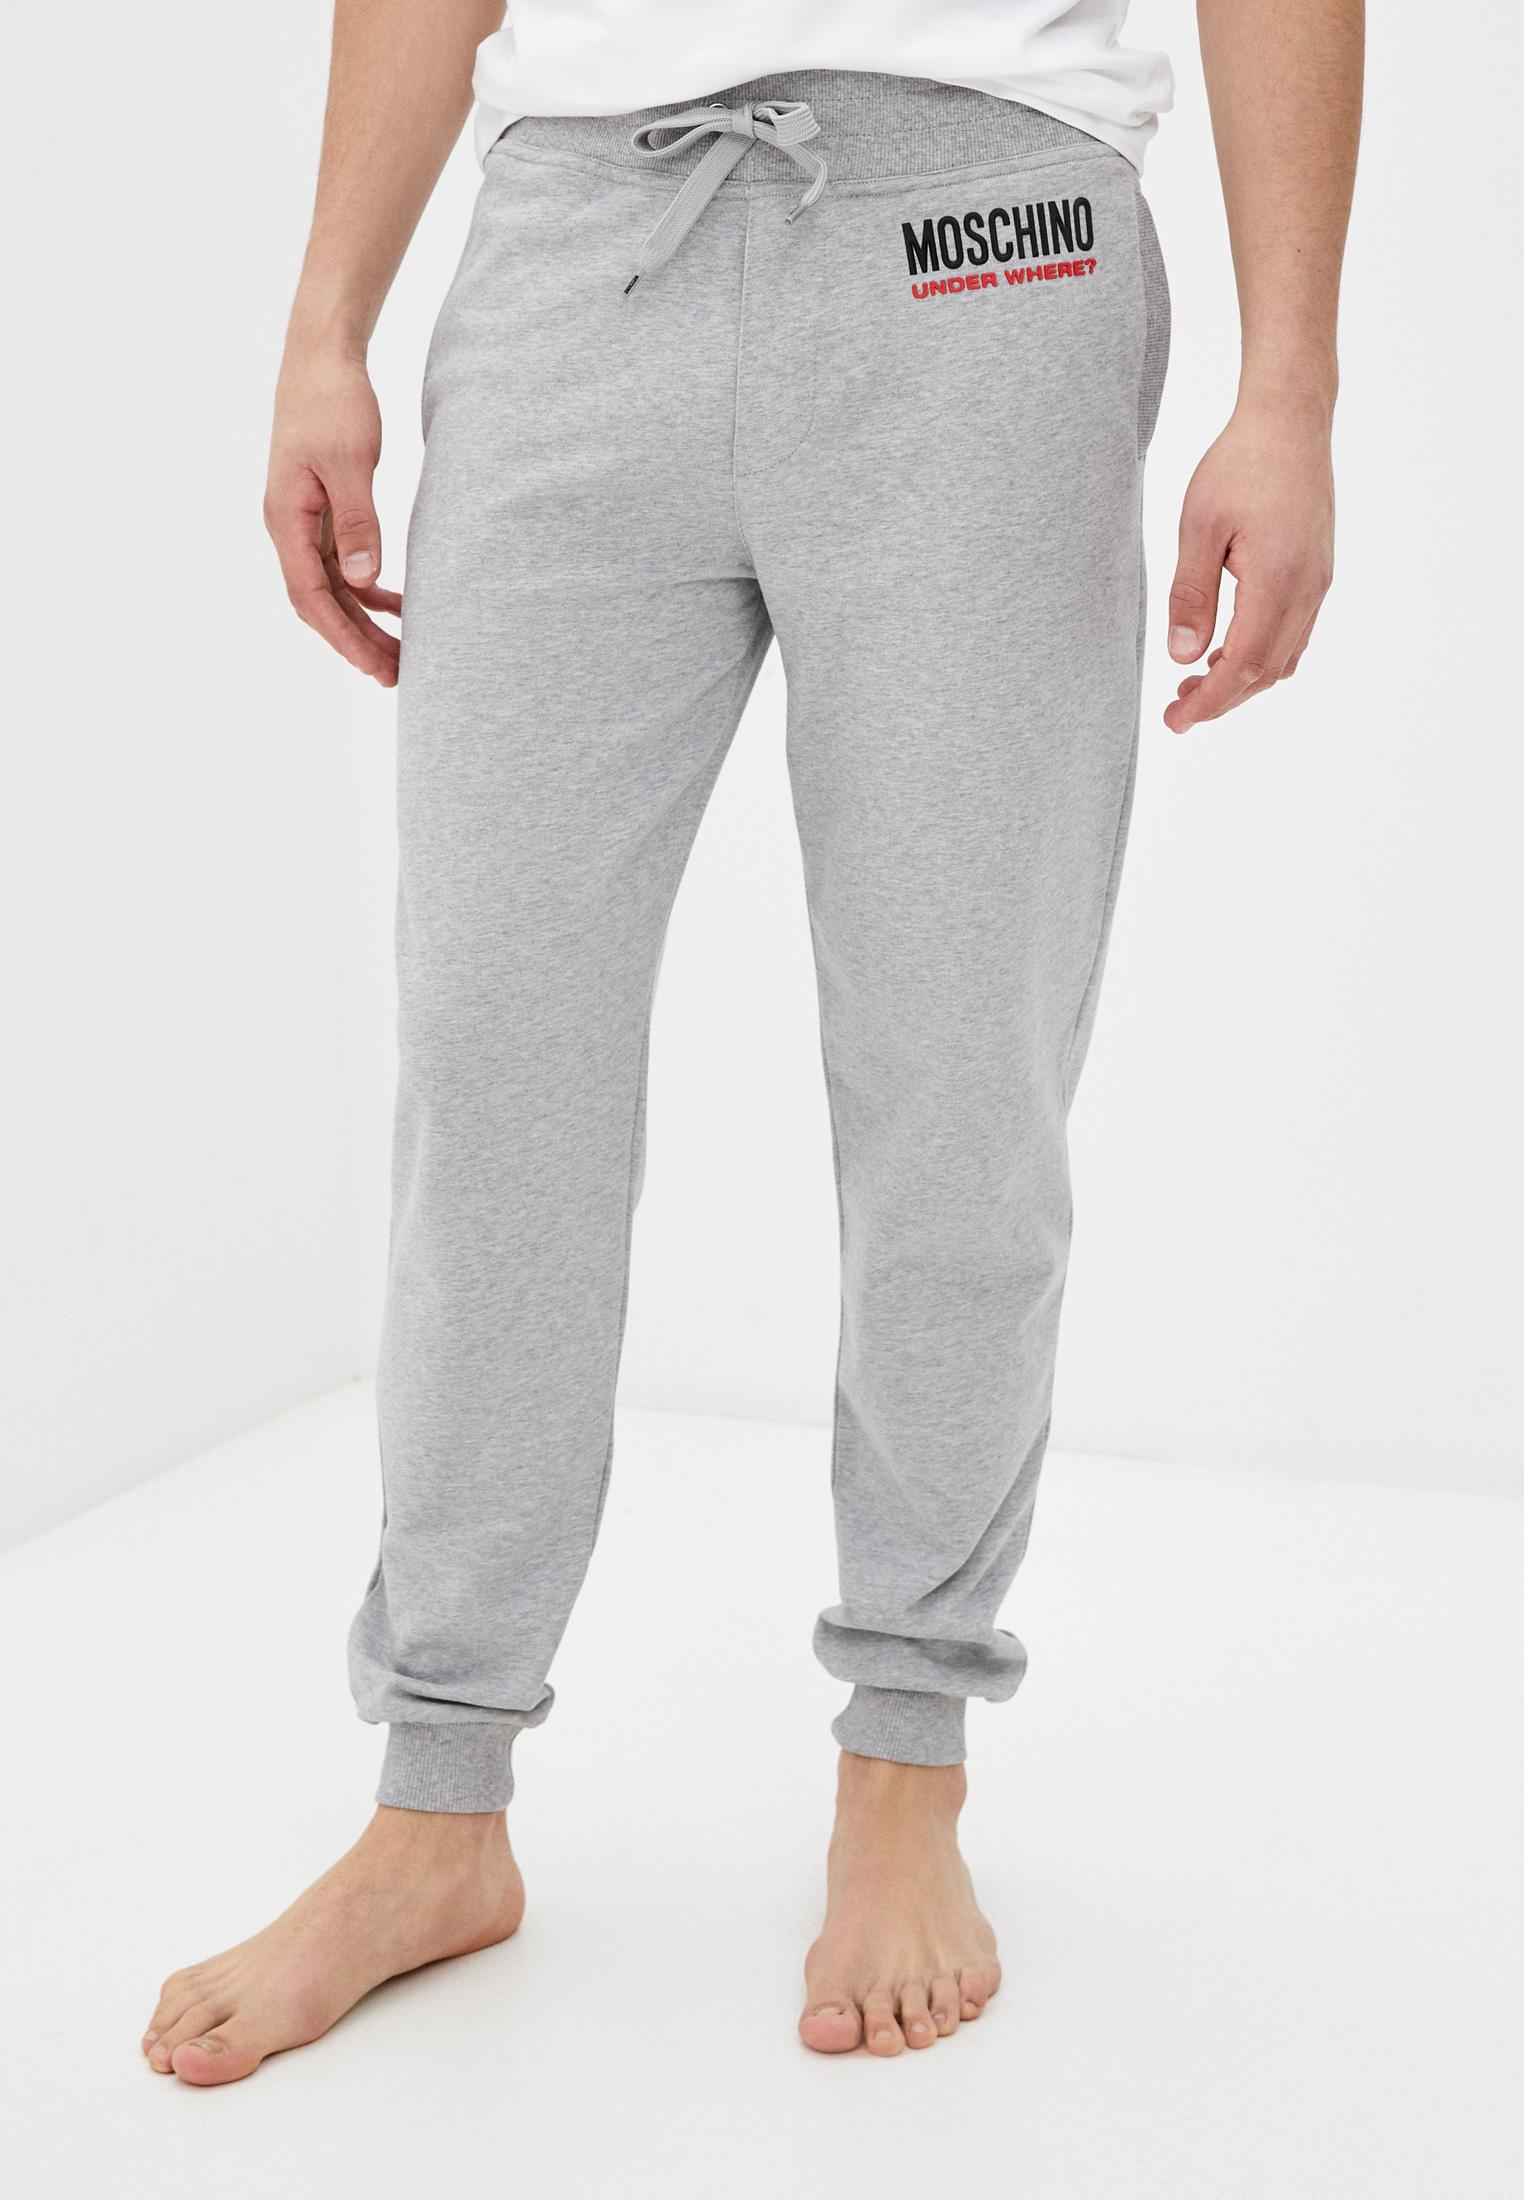 Мужские спортивные брюки Moschino Underwear 4322 8127